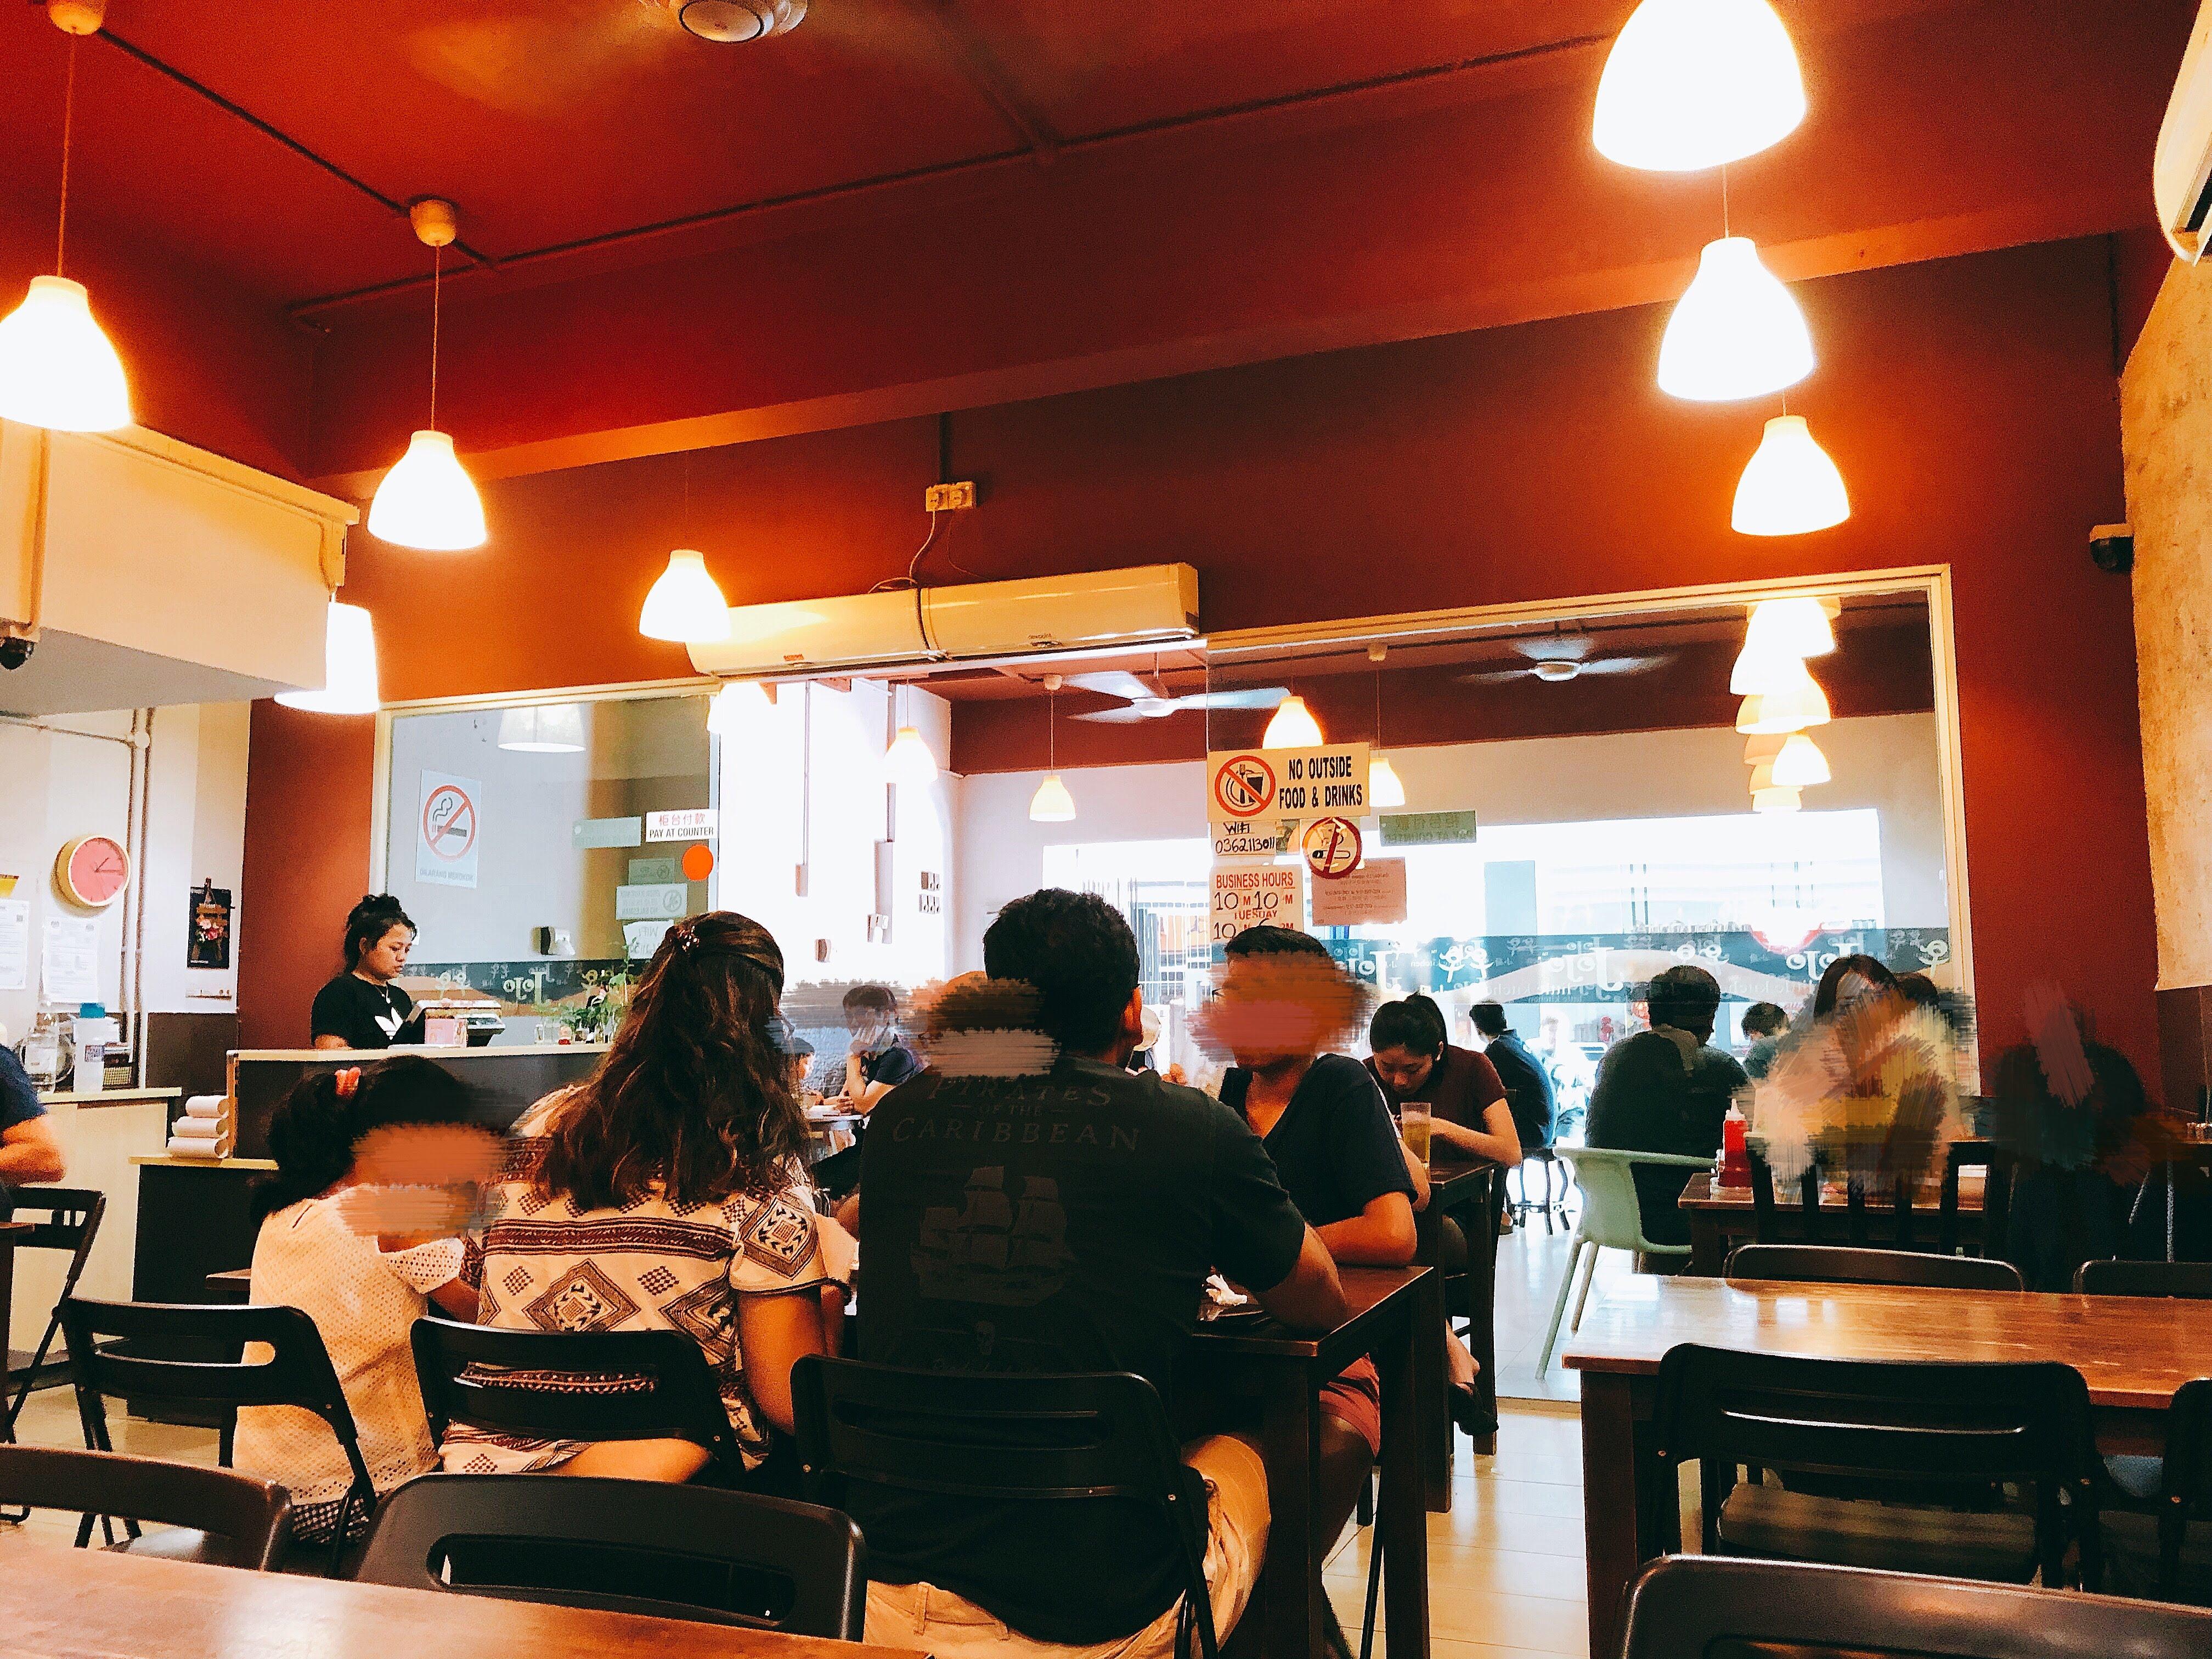 "Malaysia_Localgourmet_Store_009"""""